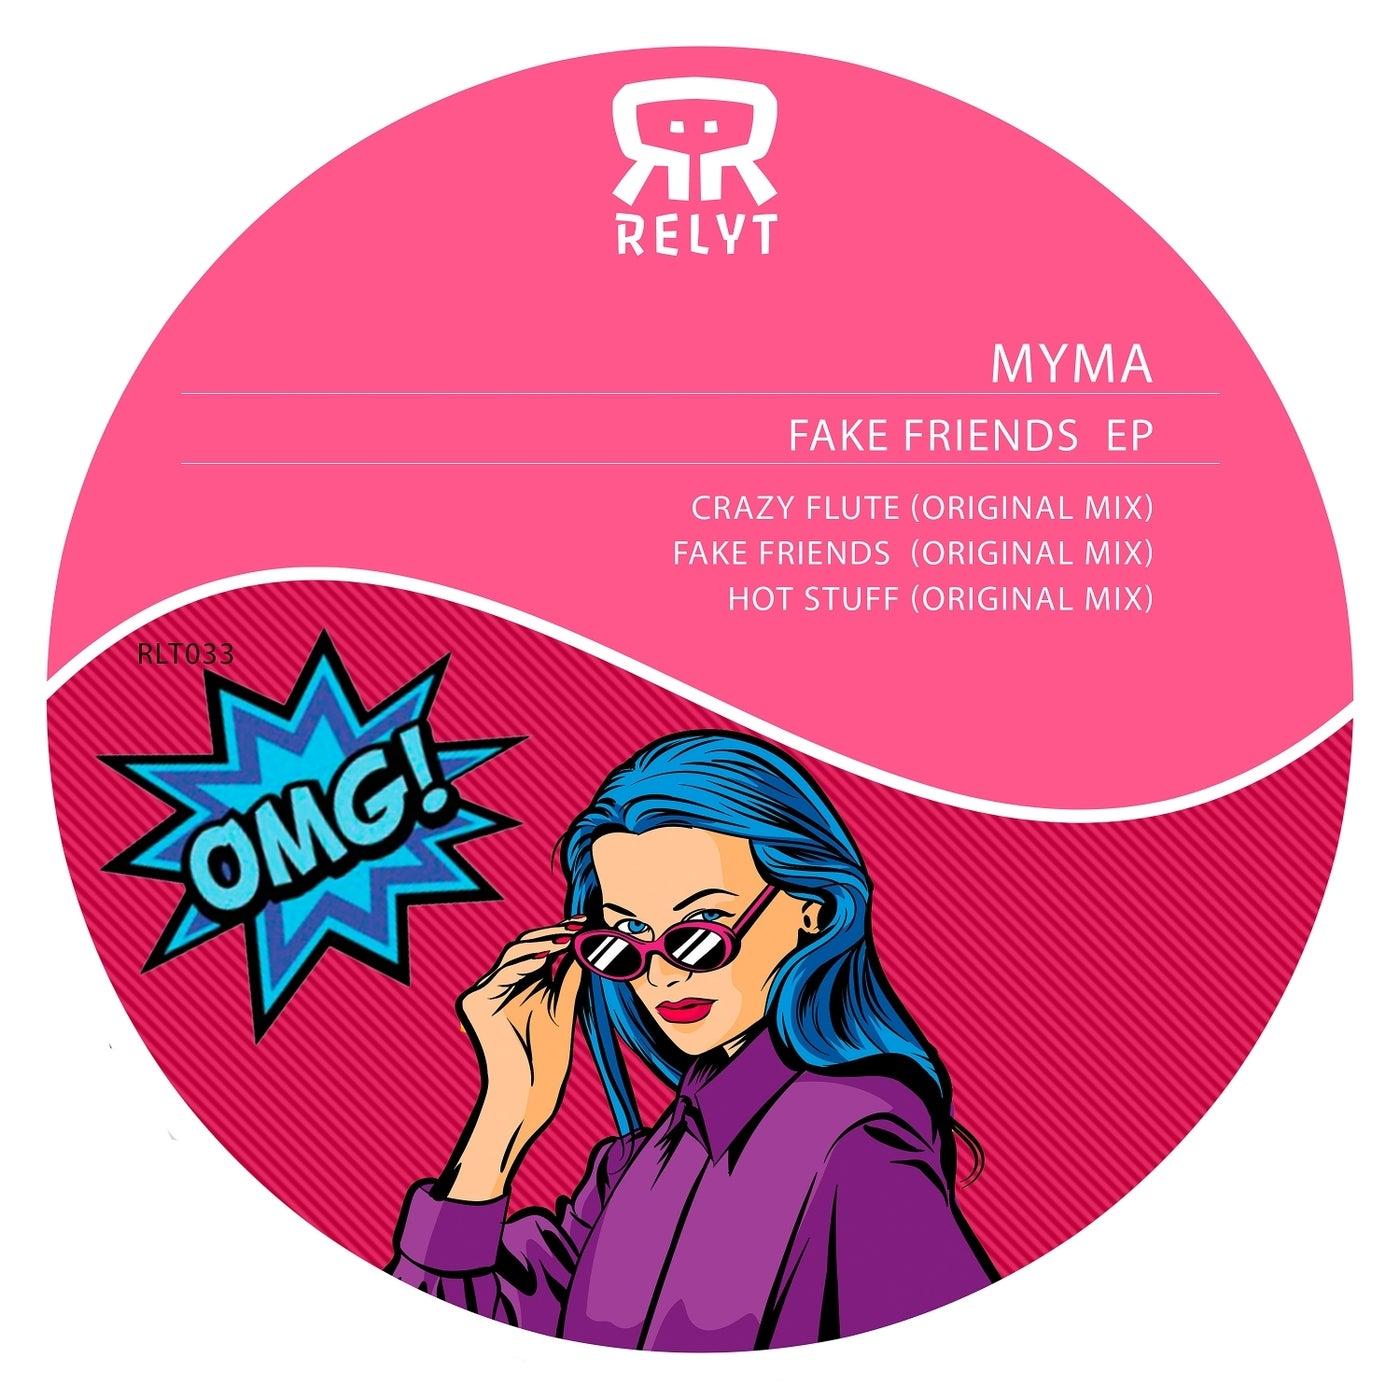 Fake Friends EP